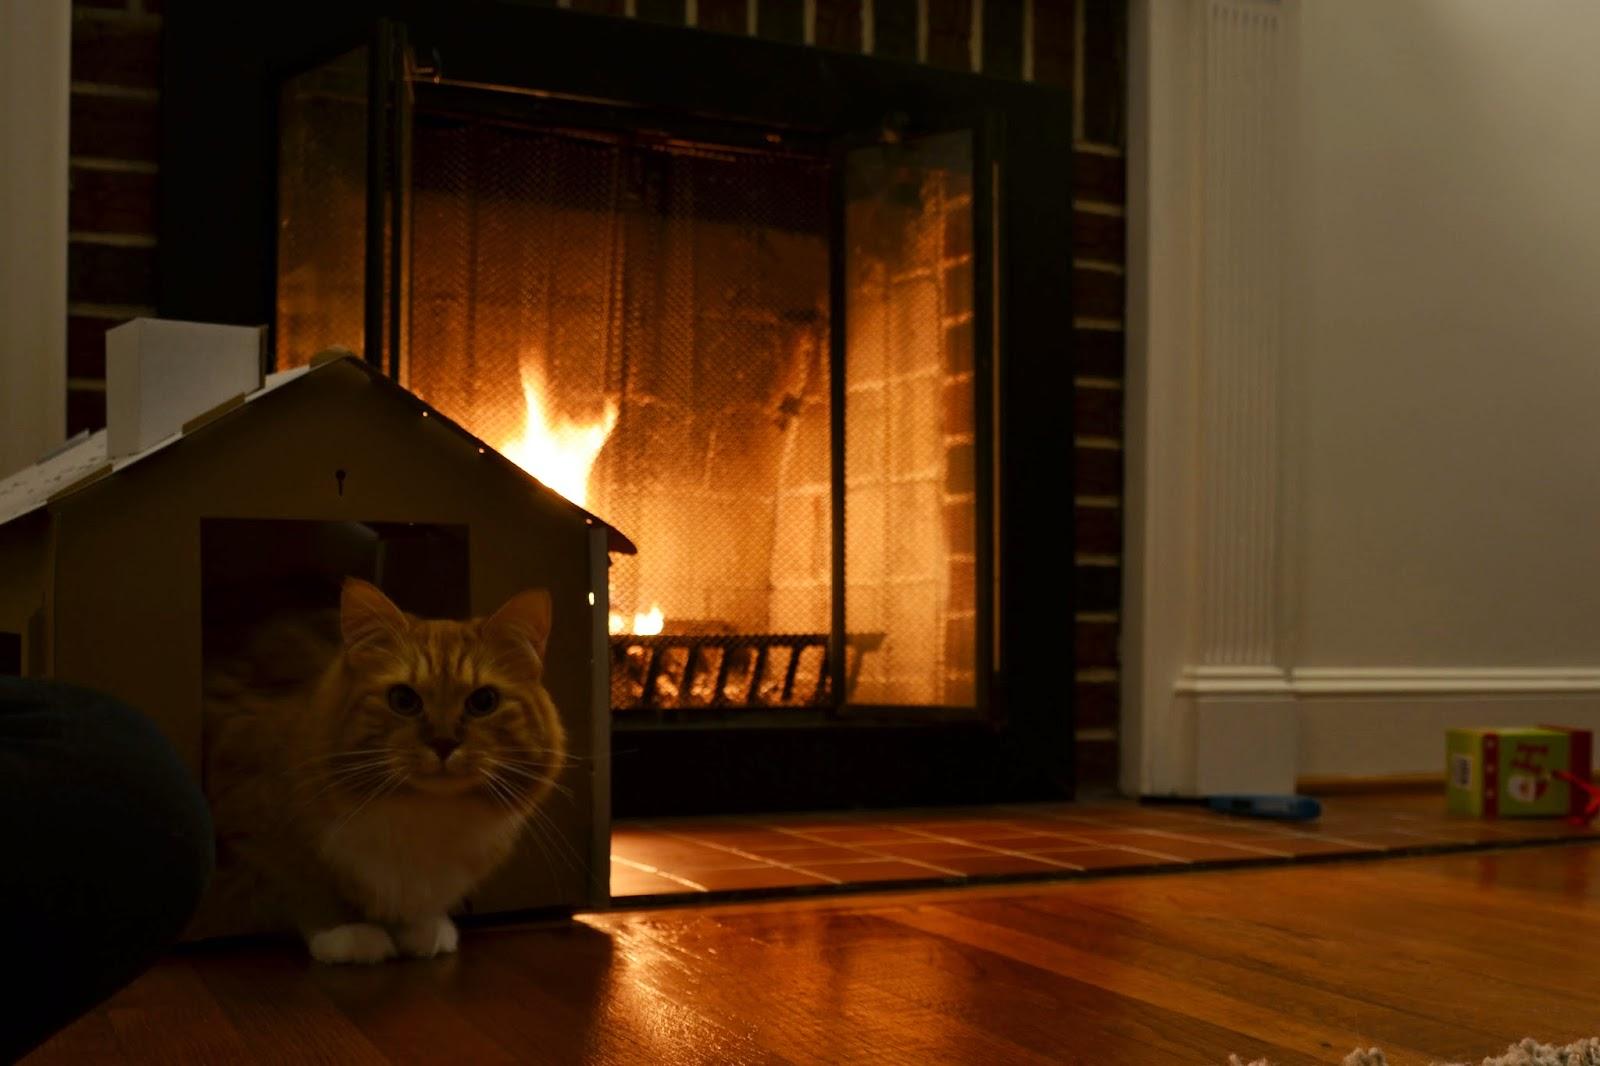 lostvestige cat photos friday 46 long exposure cat shots